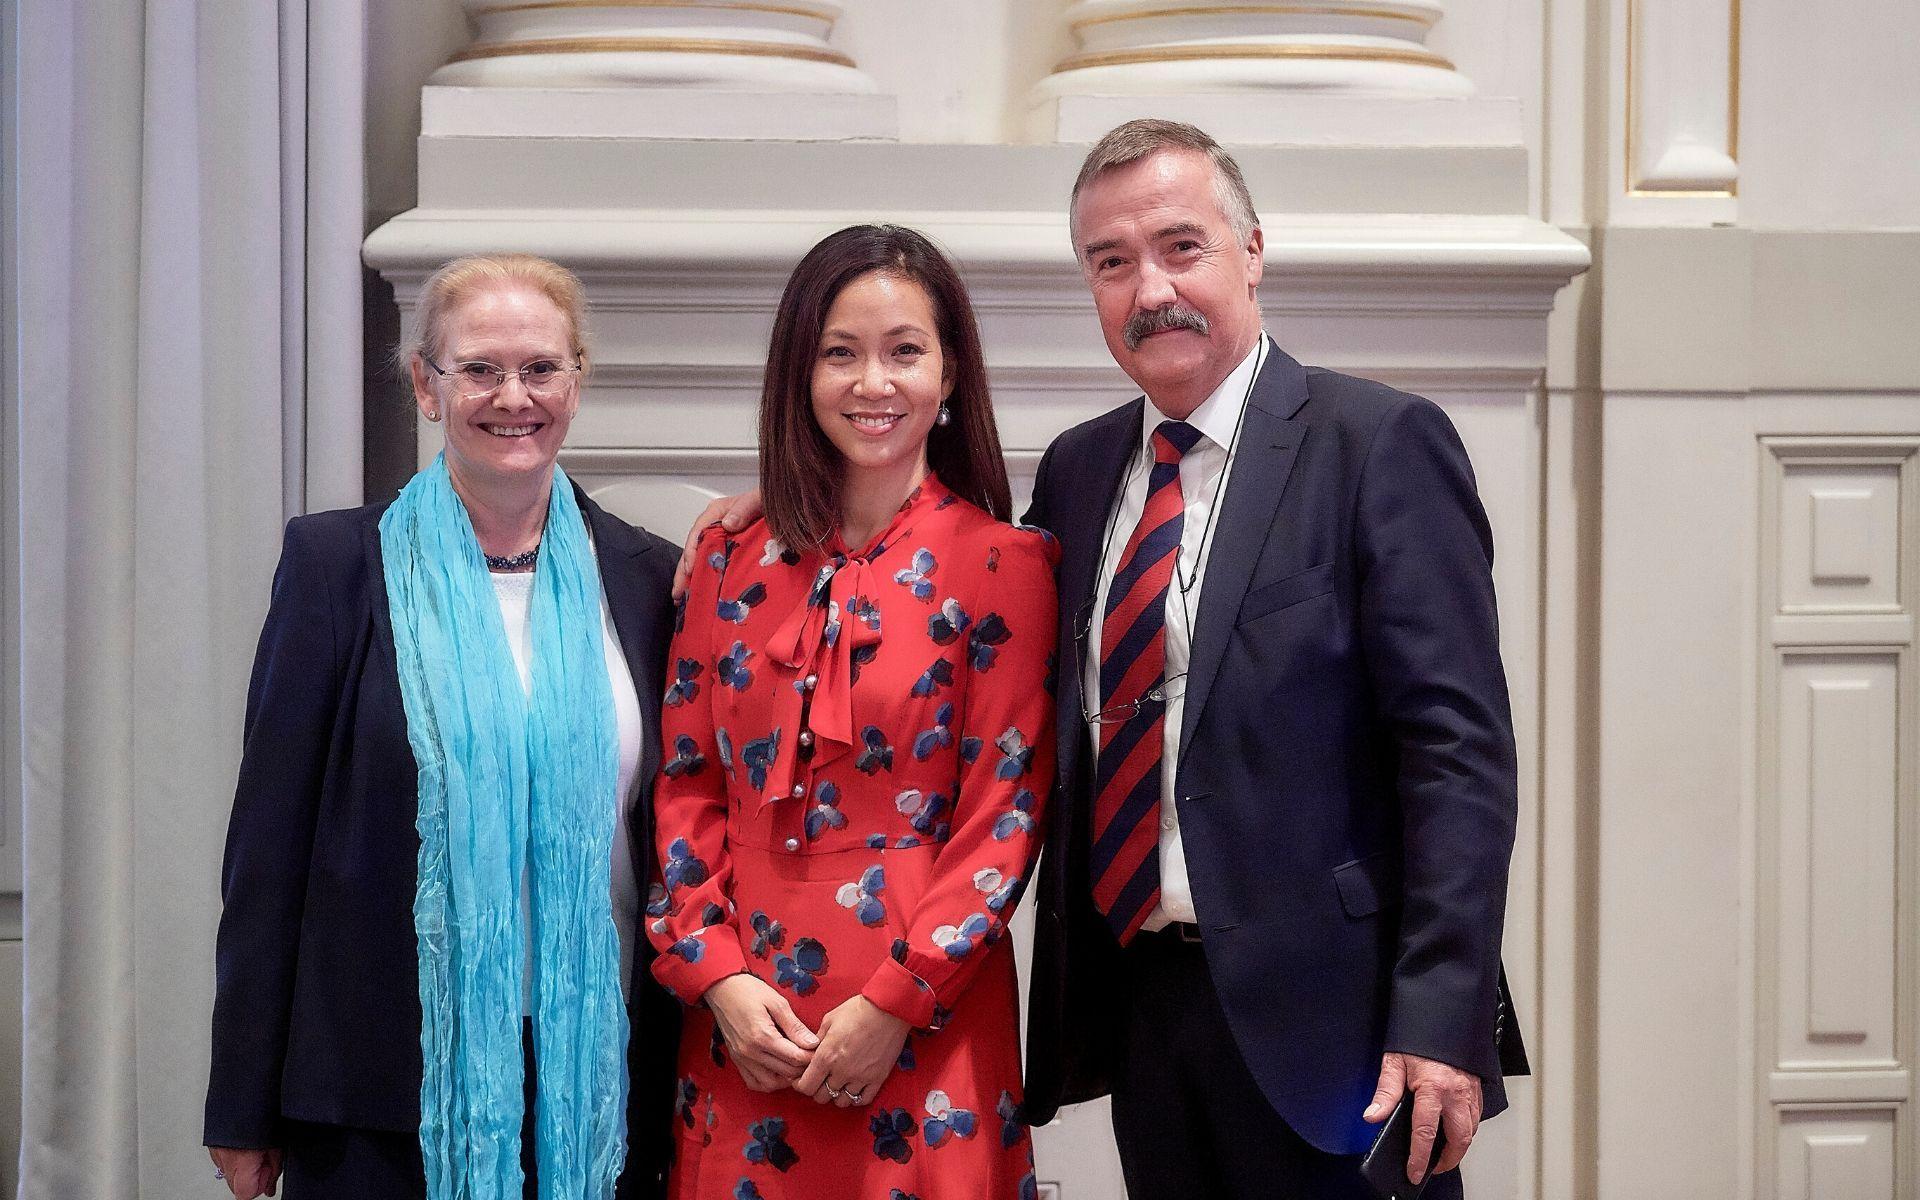 Aplicar Cantidad de rosado  Award-Winning Malaysian Scientist Dr Serena Nik-Zainal Speaks Up ...